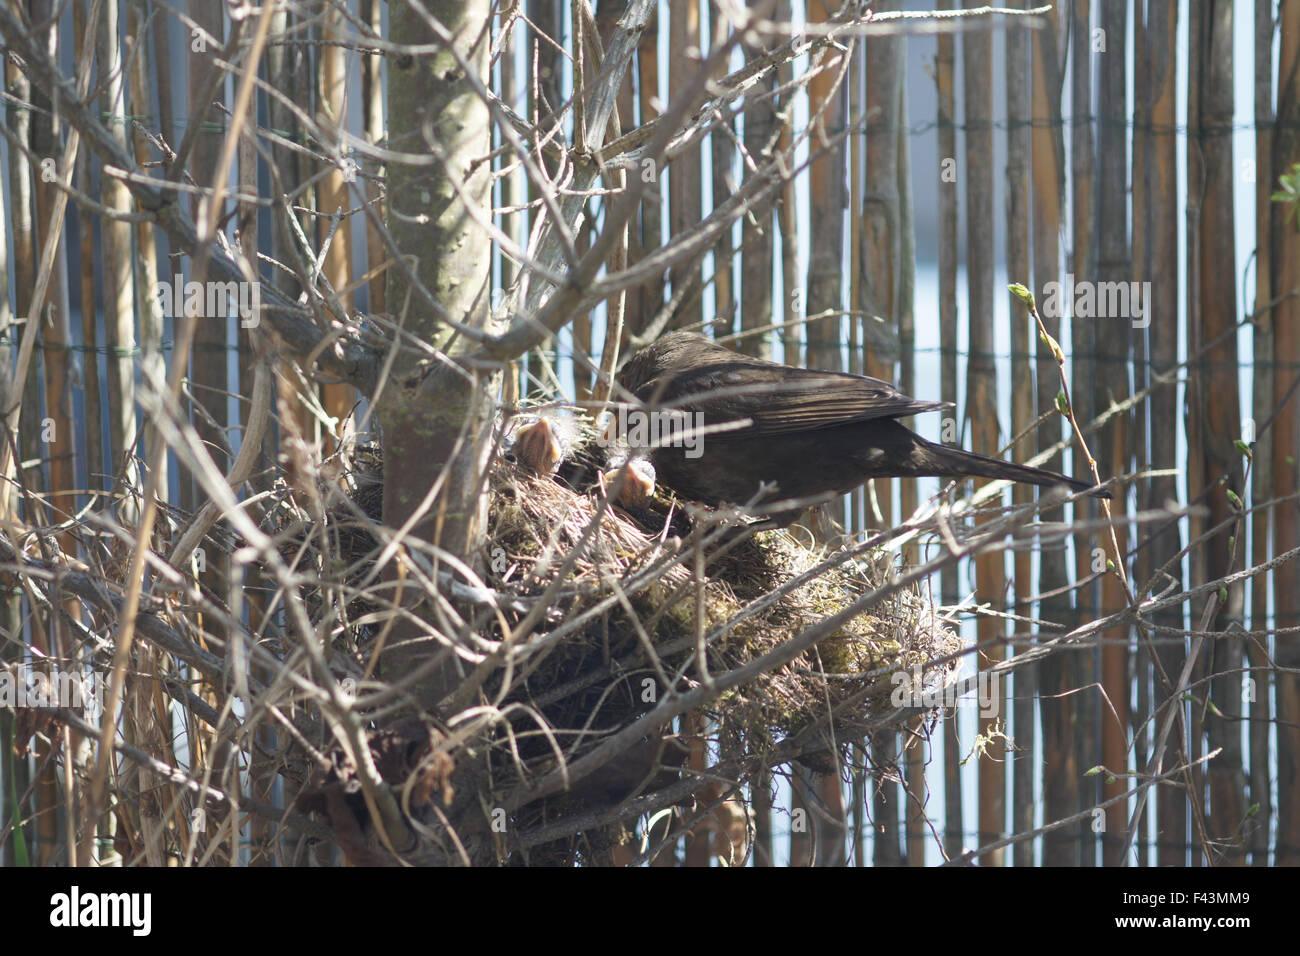 Blackbird - Stock Image